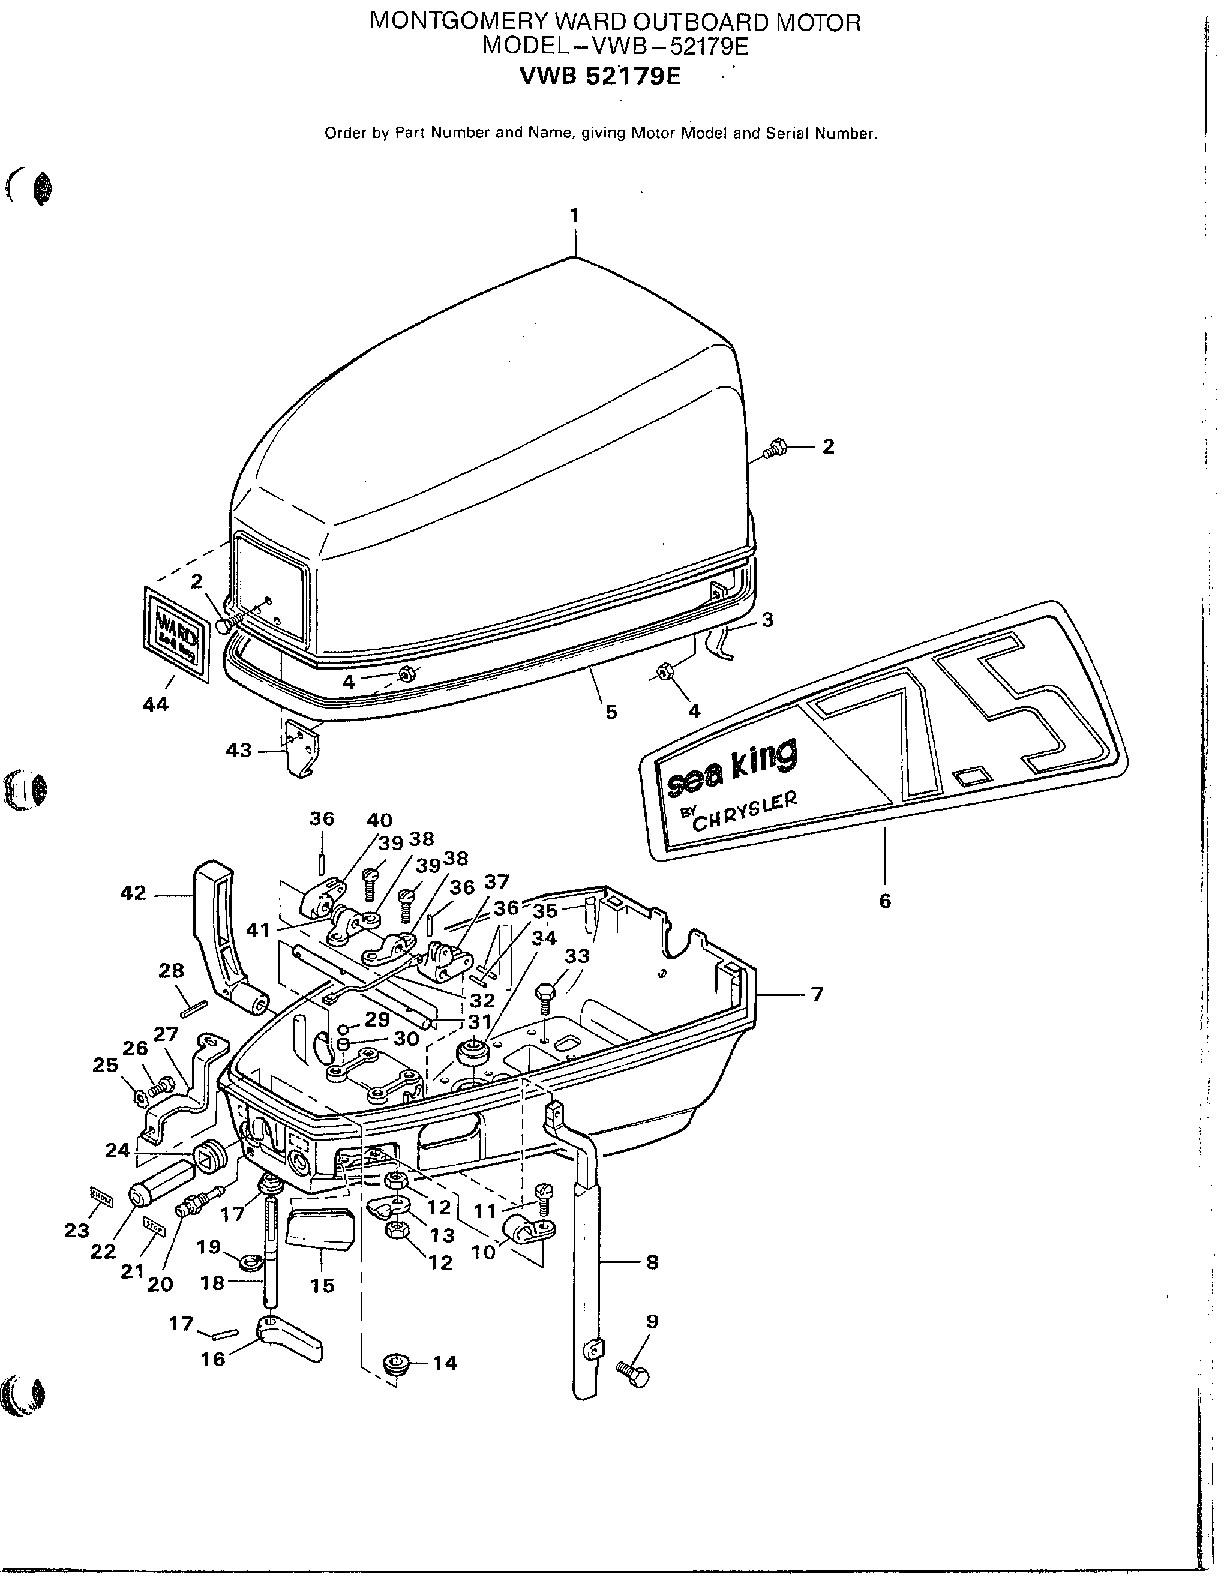 outboard motor lower unit diagram nissan navara radio wiring mercury engine my